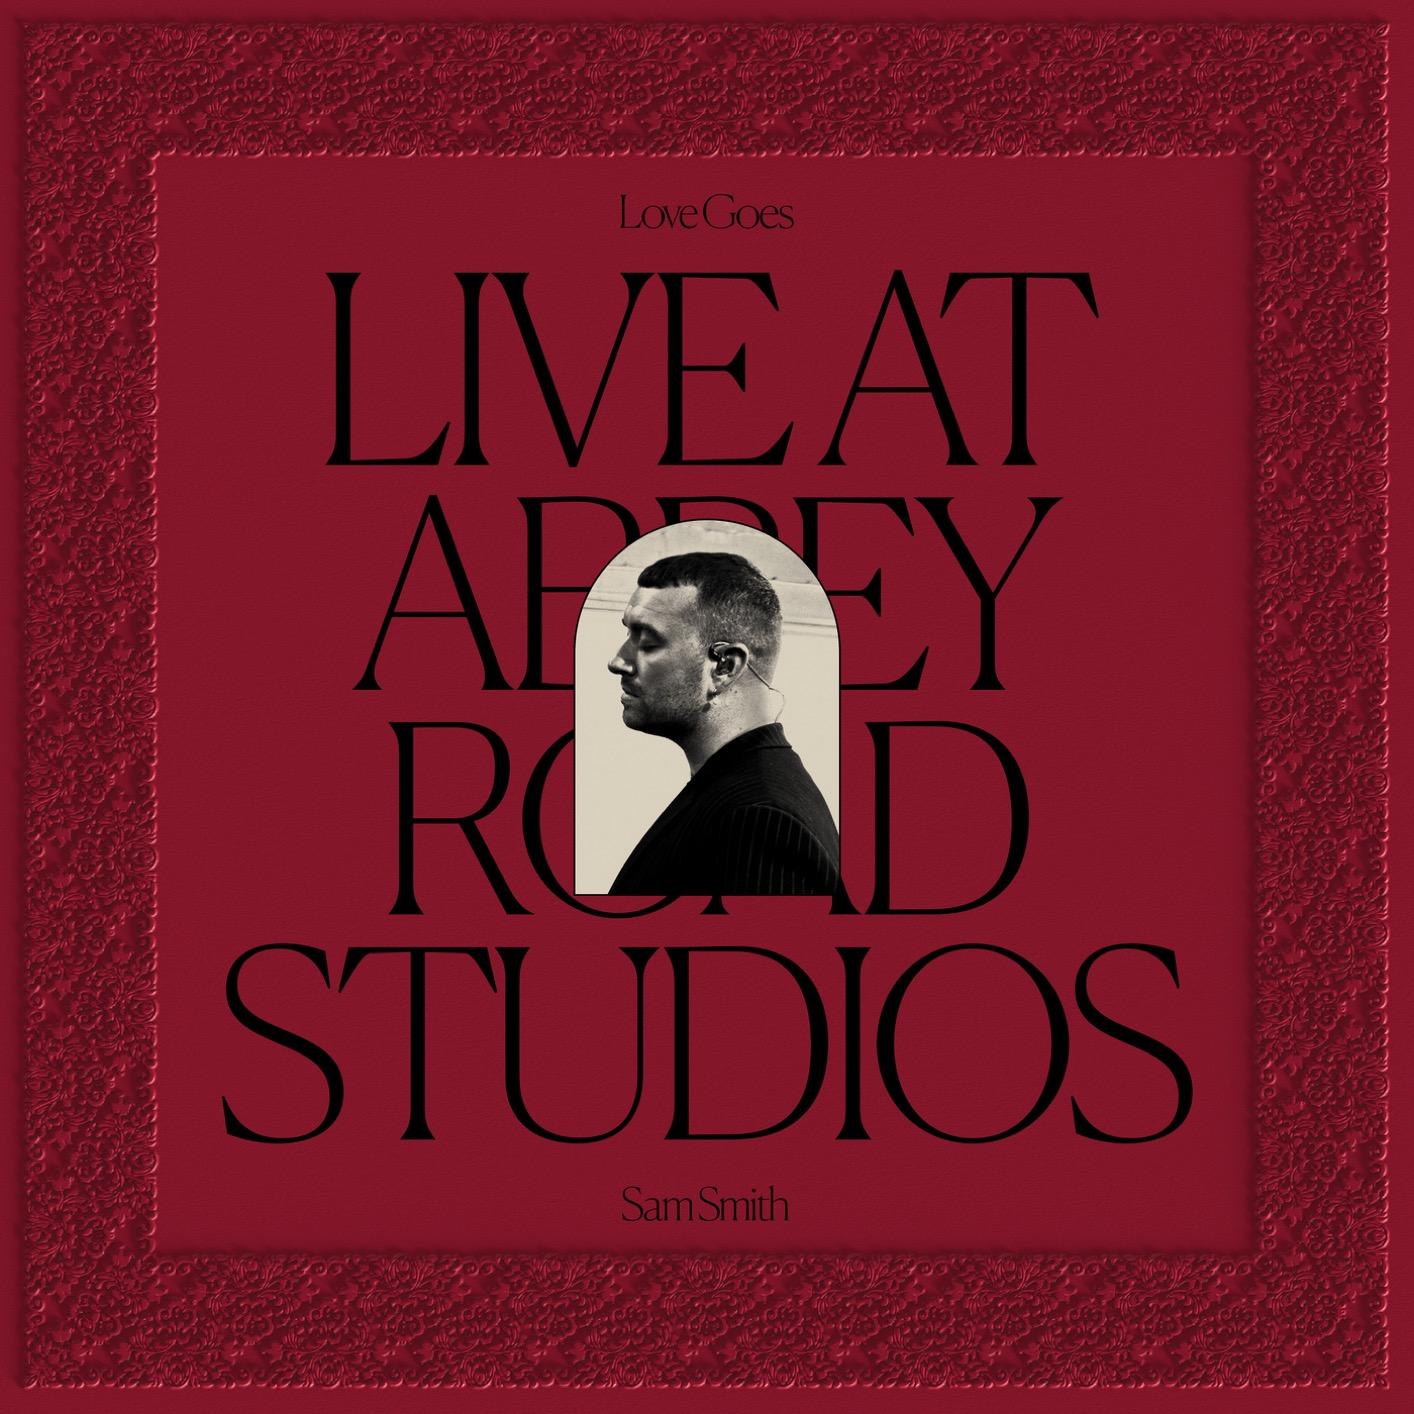 Love Goes: Live at Abbey Road Studios | HIGHRESAUDIO